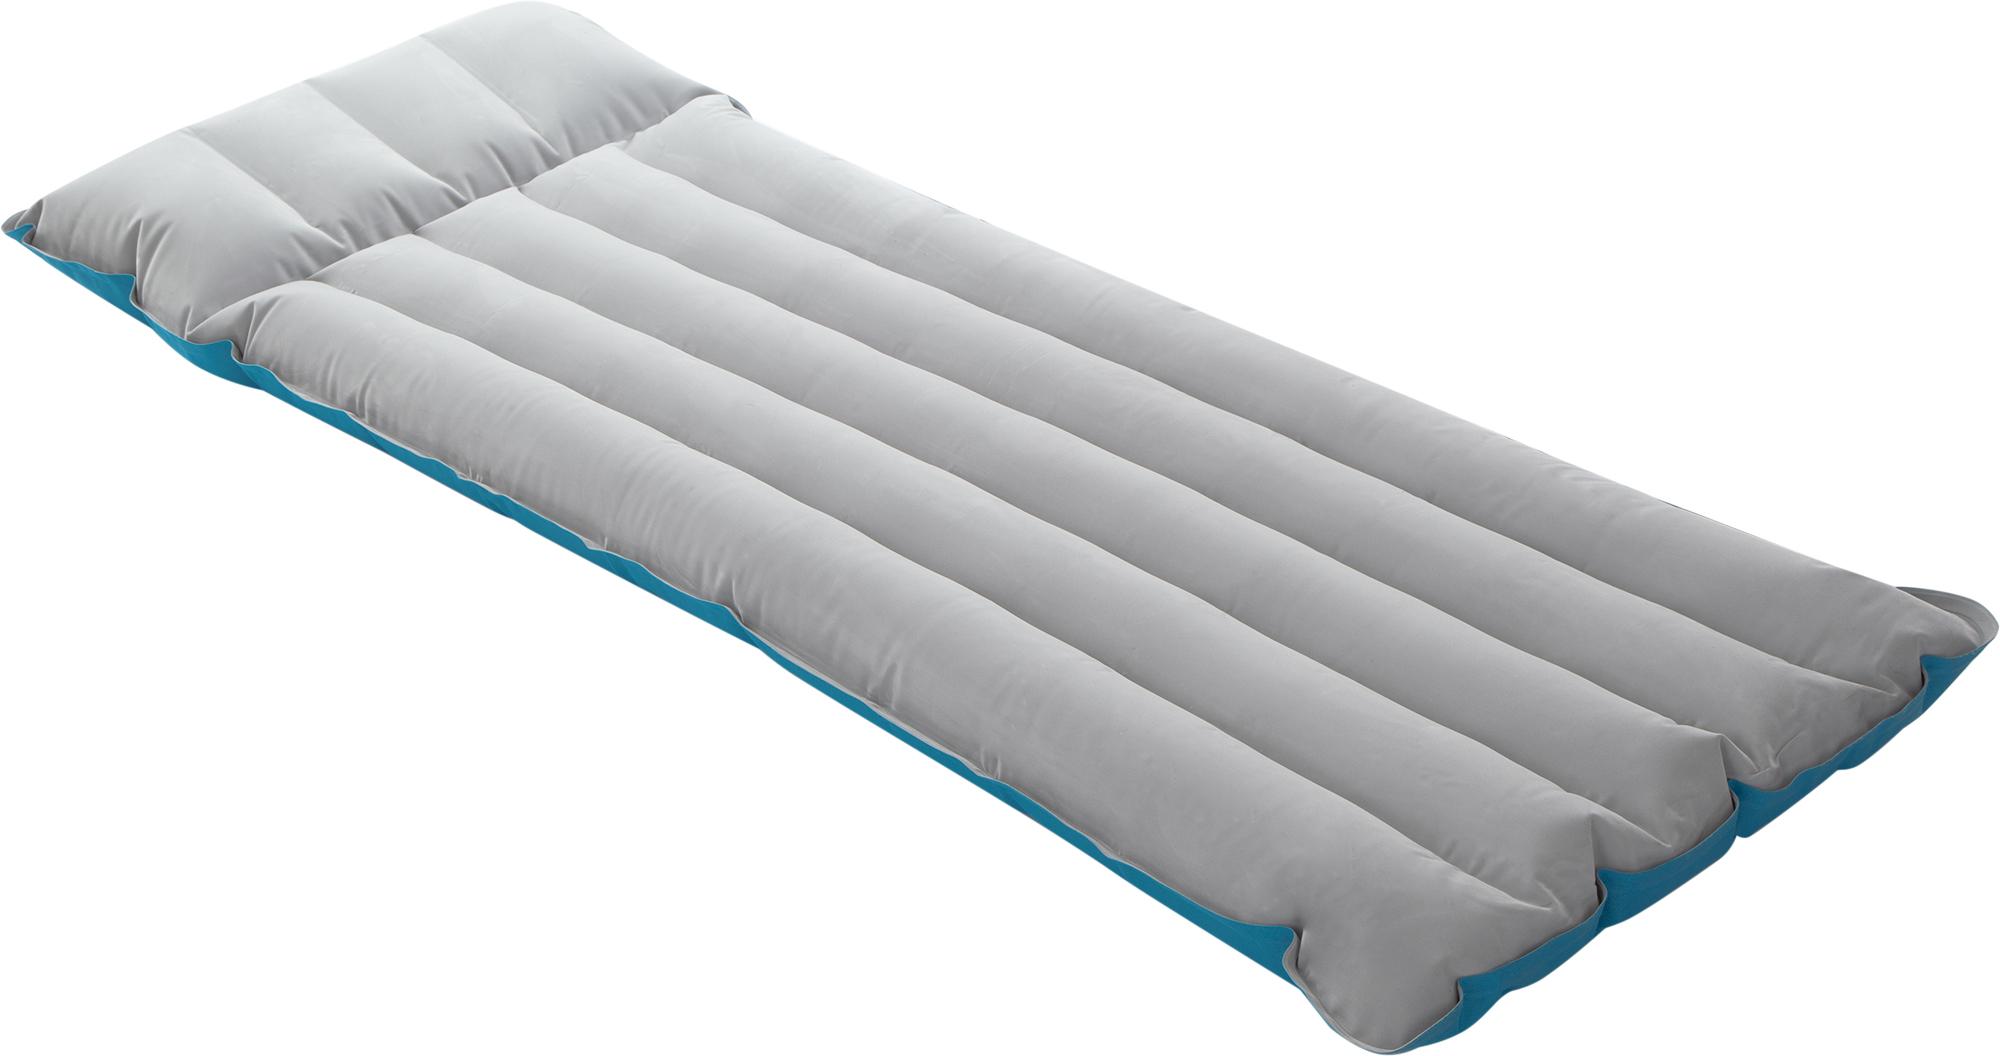 Intex Матрас надувной Intex надувная мебель intex надувной матрас турист 76х191х15см ручной насос ламинир tpu